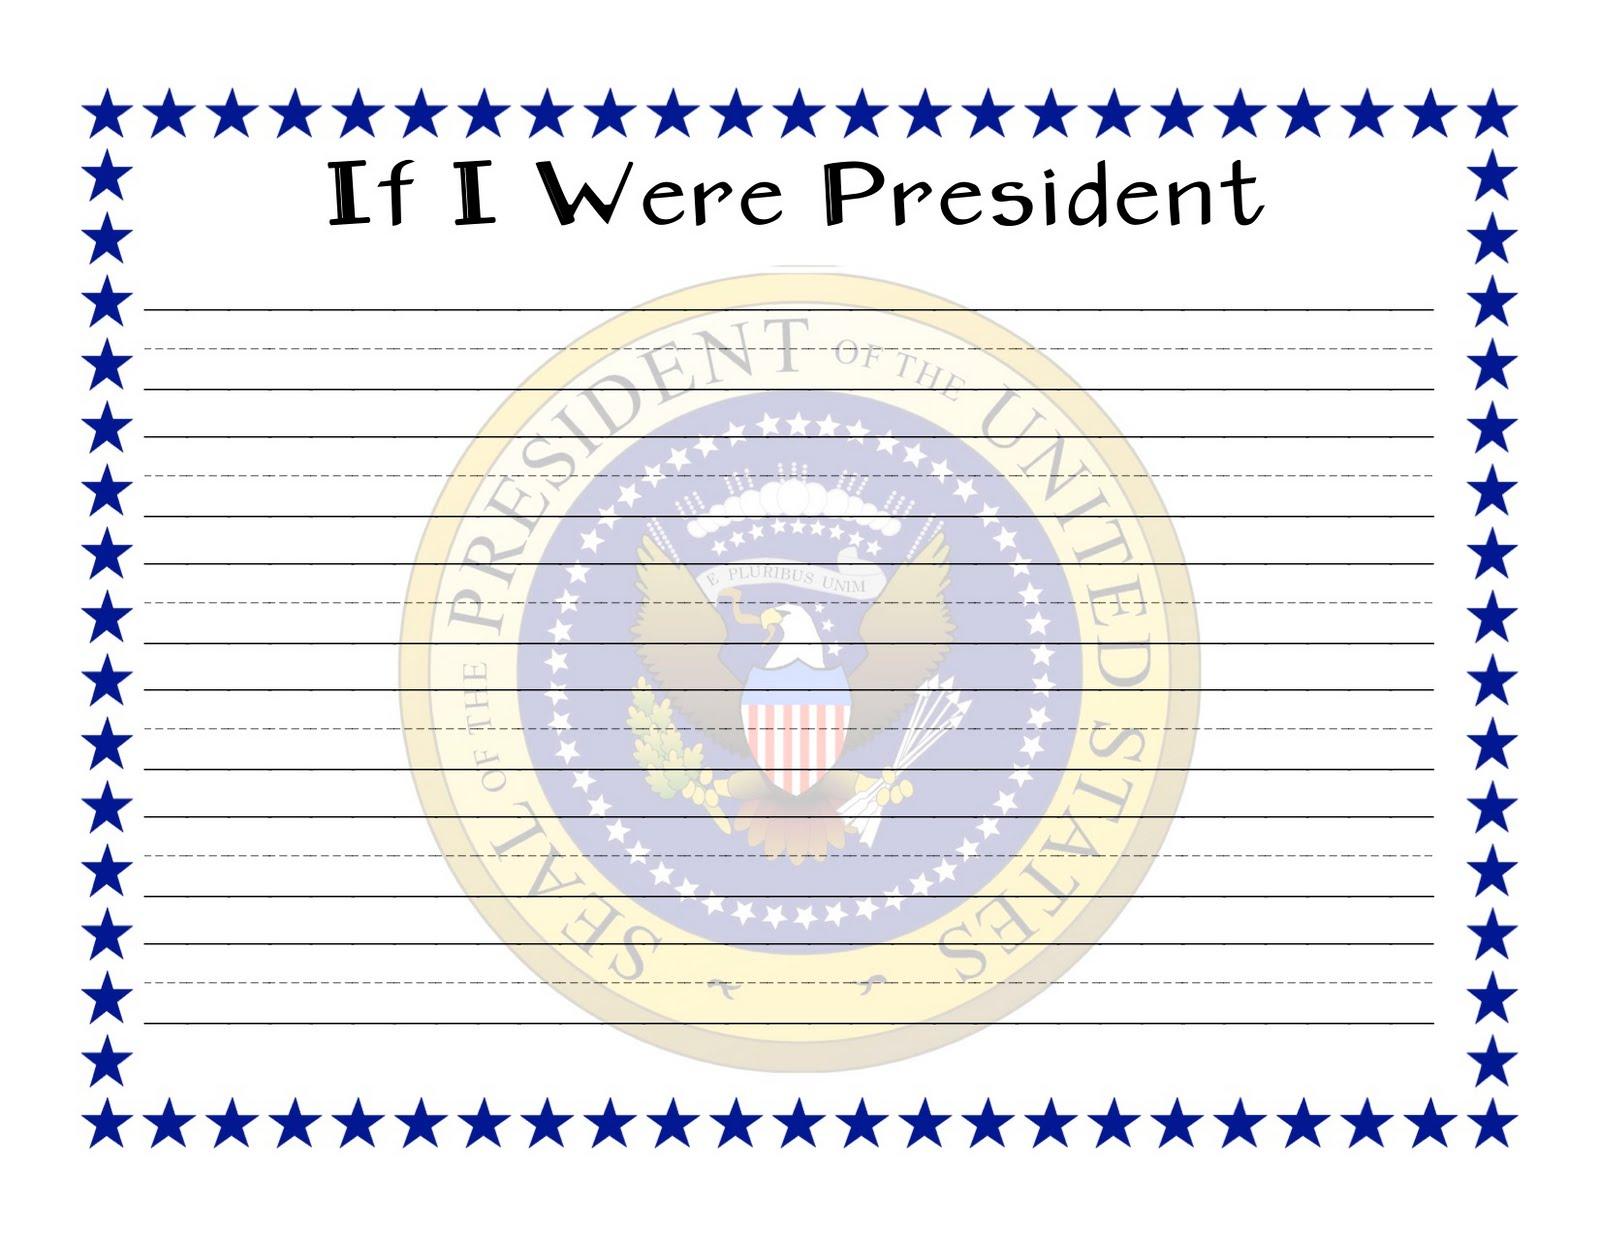 i were president essay contest if i were president essay contest